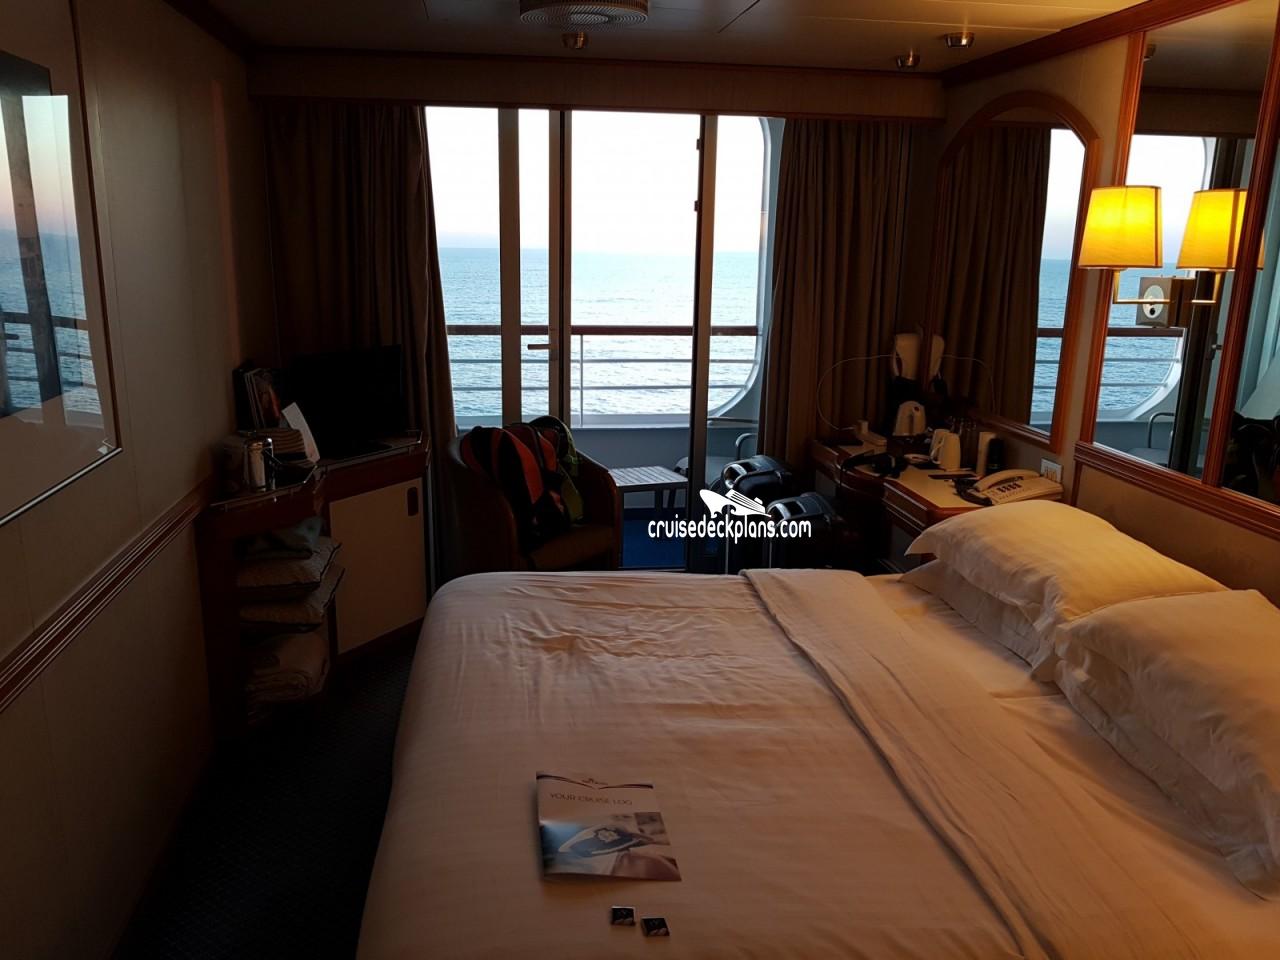 Oceana Deck Plans Diagrams Pictures Video